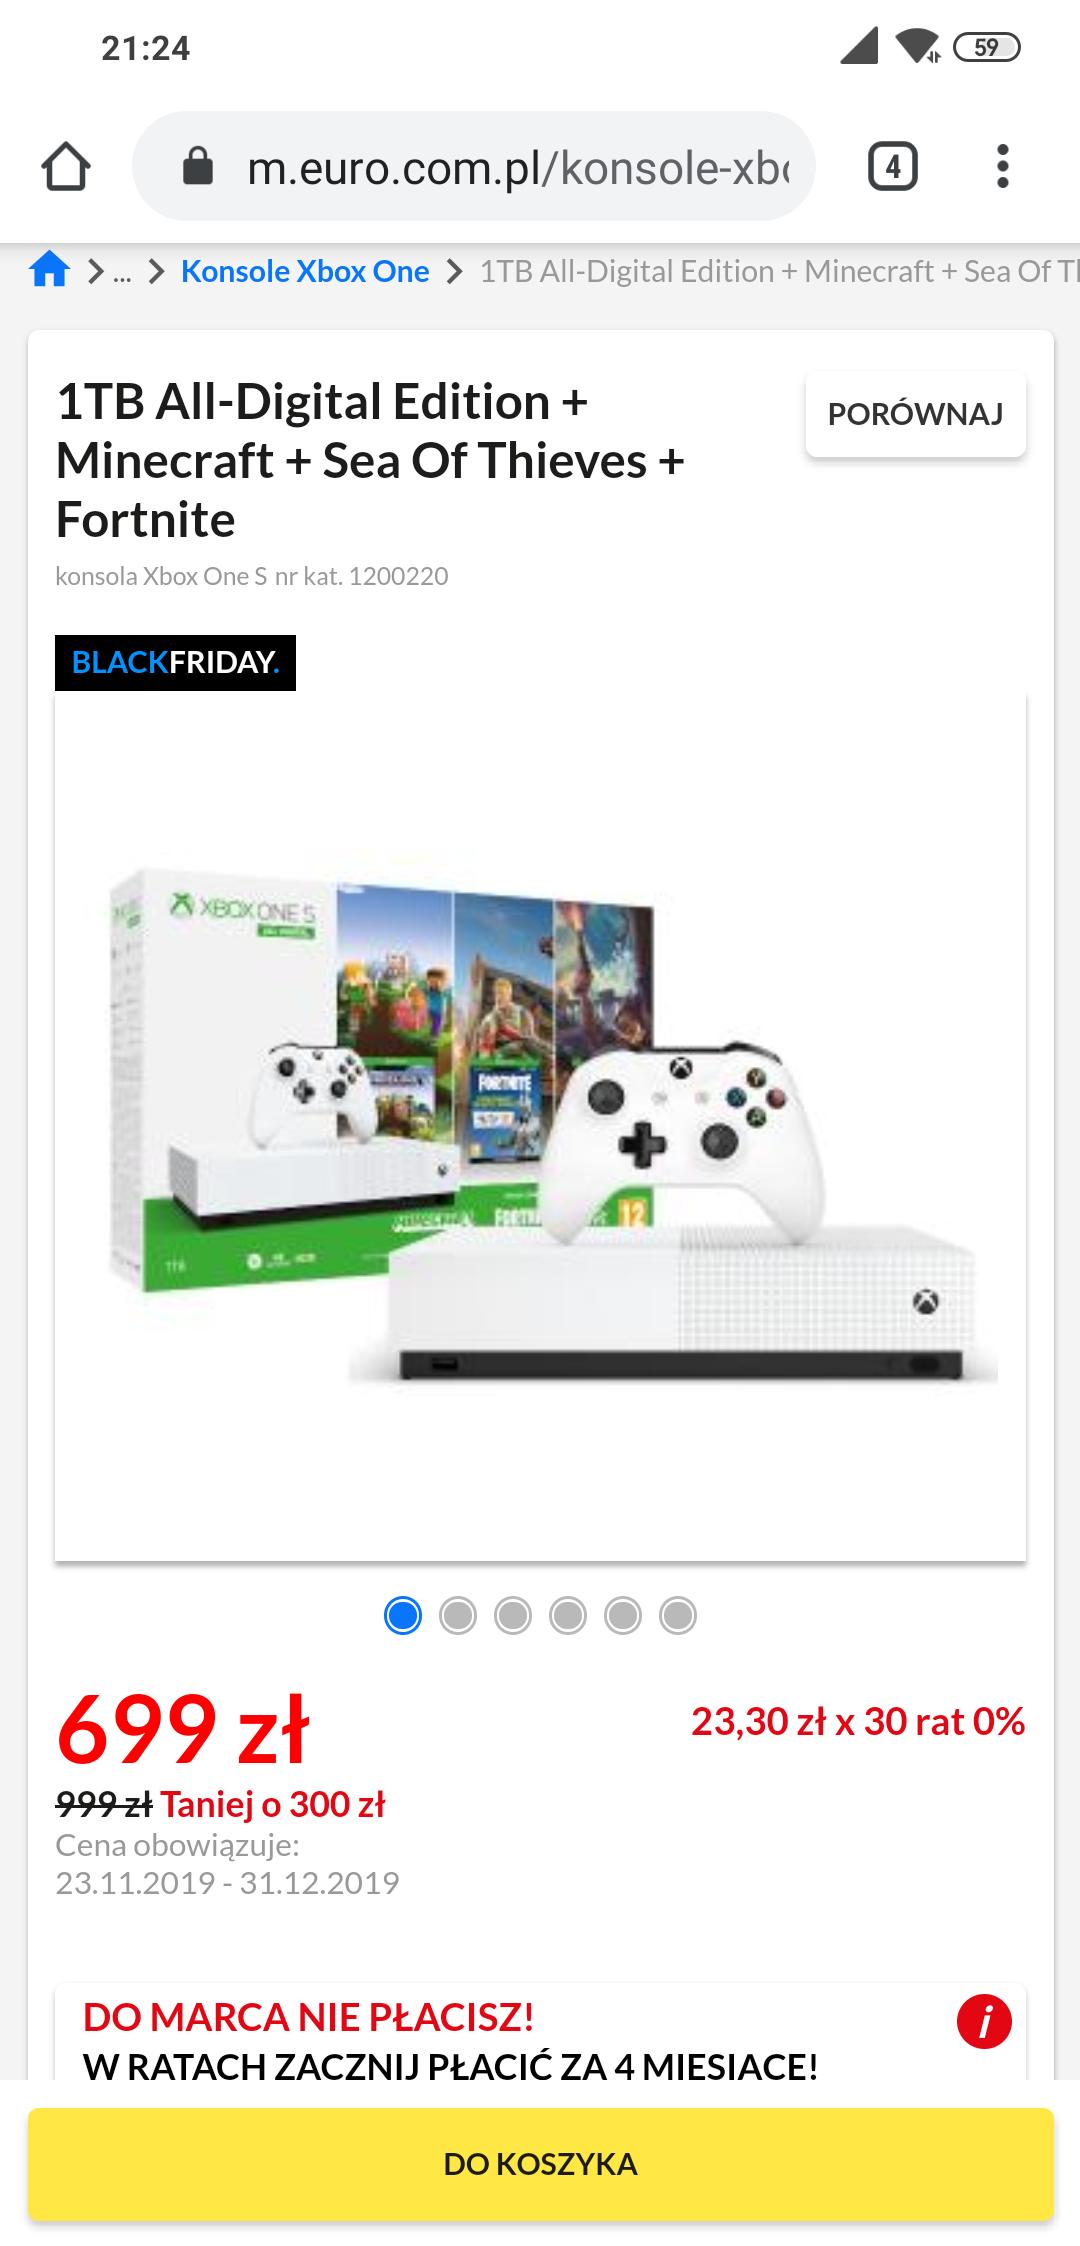 Konsola Xbox one S 1TB All-Digital Edition + Minecraft + Sea Of Thieves + Fortnite